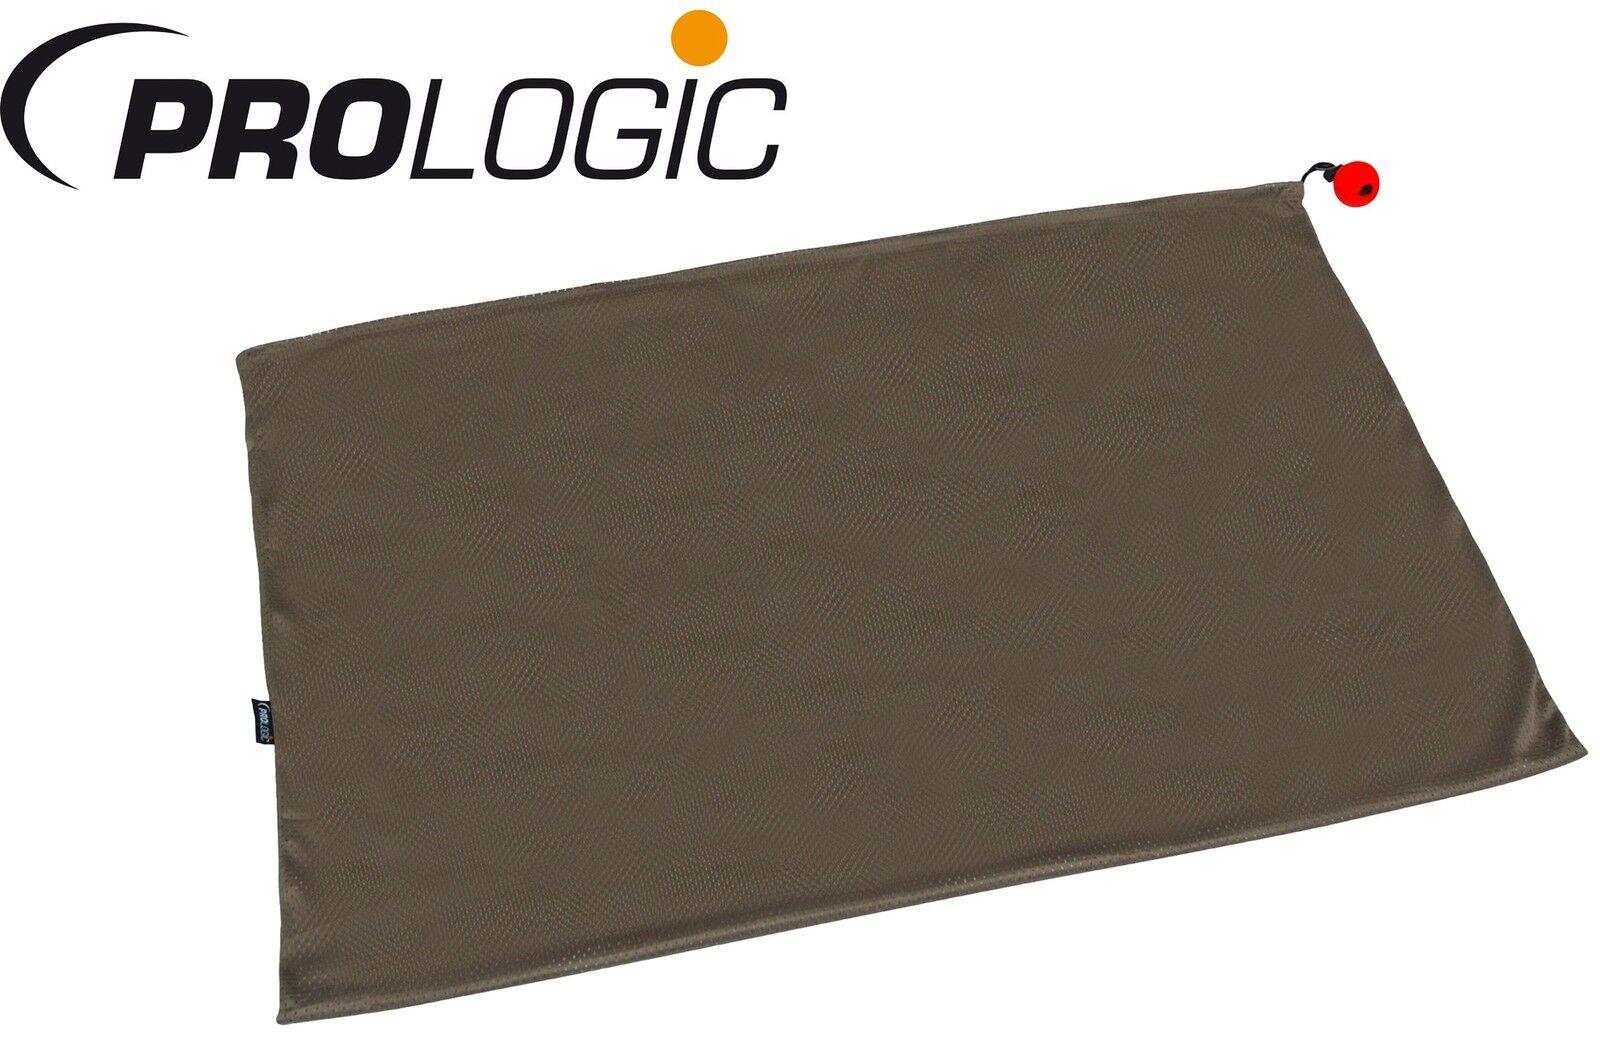 ProLogic New Verden carp saco Tamaño Tamaño Tamaño l 100x70cm-karpfensack, karpfenbeutel  compra en línea hoy